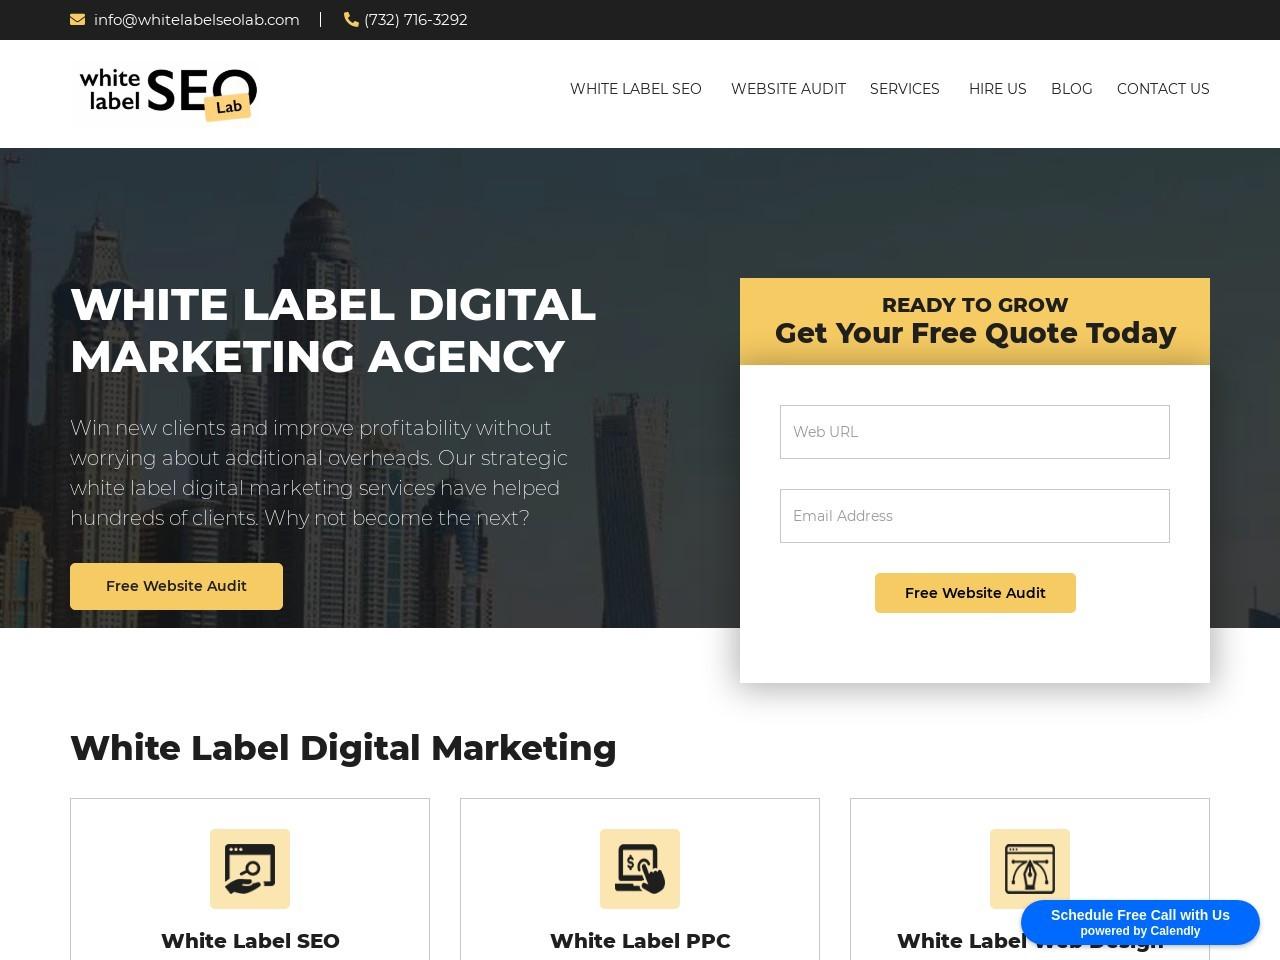 Latest News and Updates on Digital Marketing – White Label SEO Lab